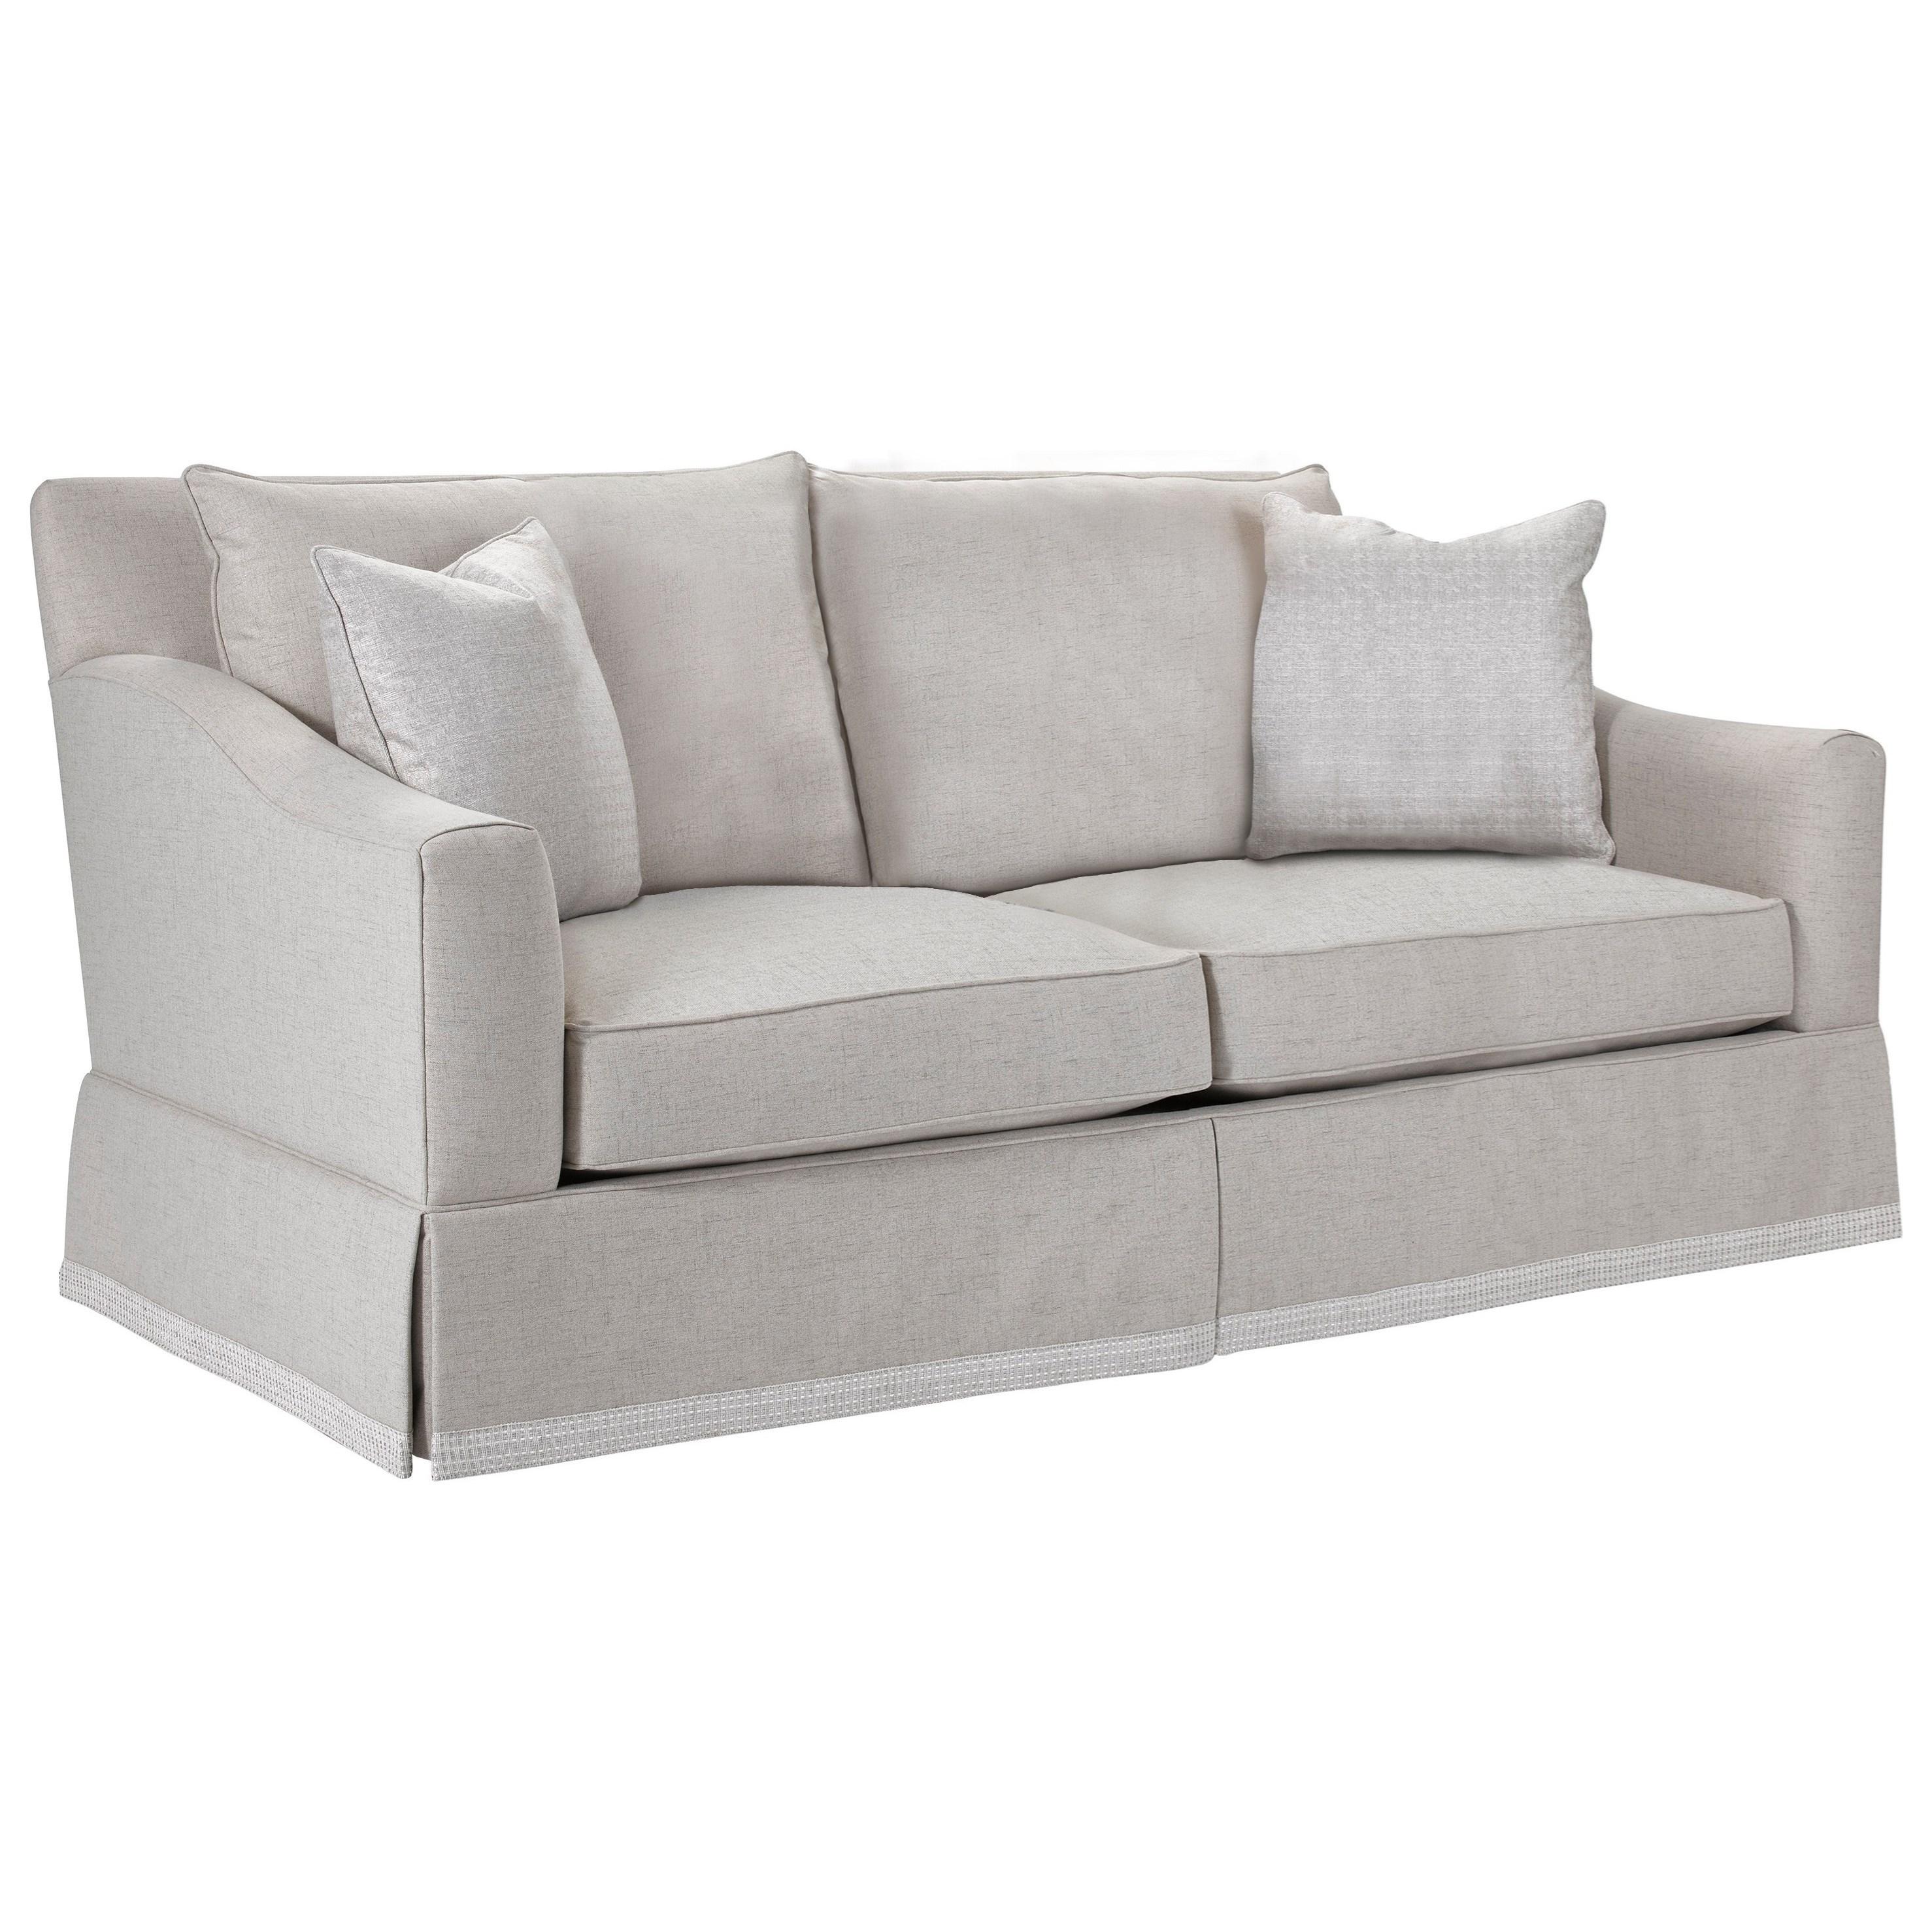 Broyhill Furniture Regina Apartment Sofa With Decorative Border Skirt